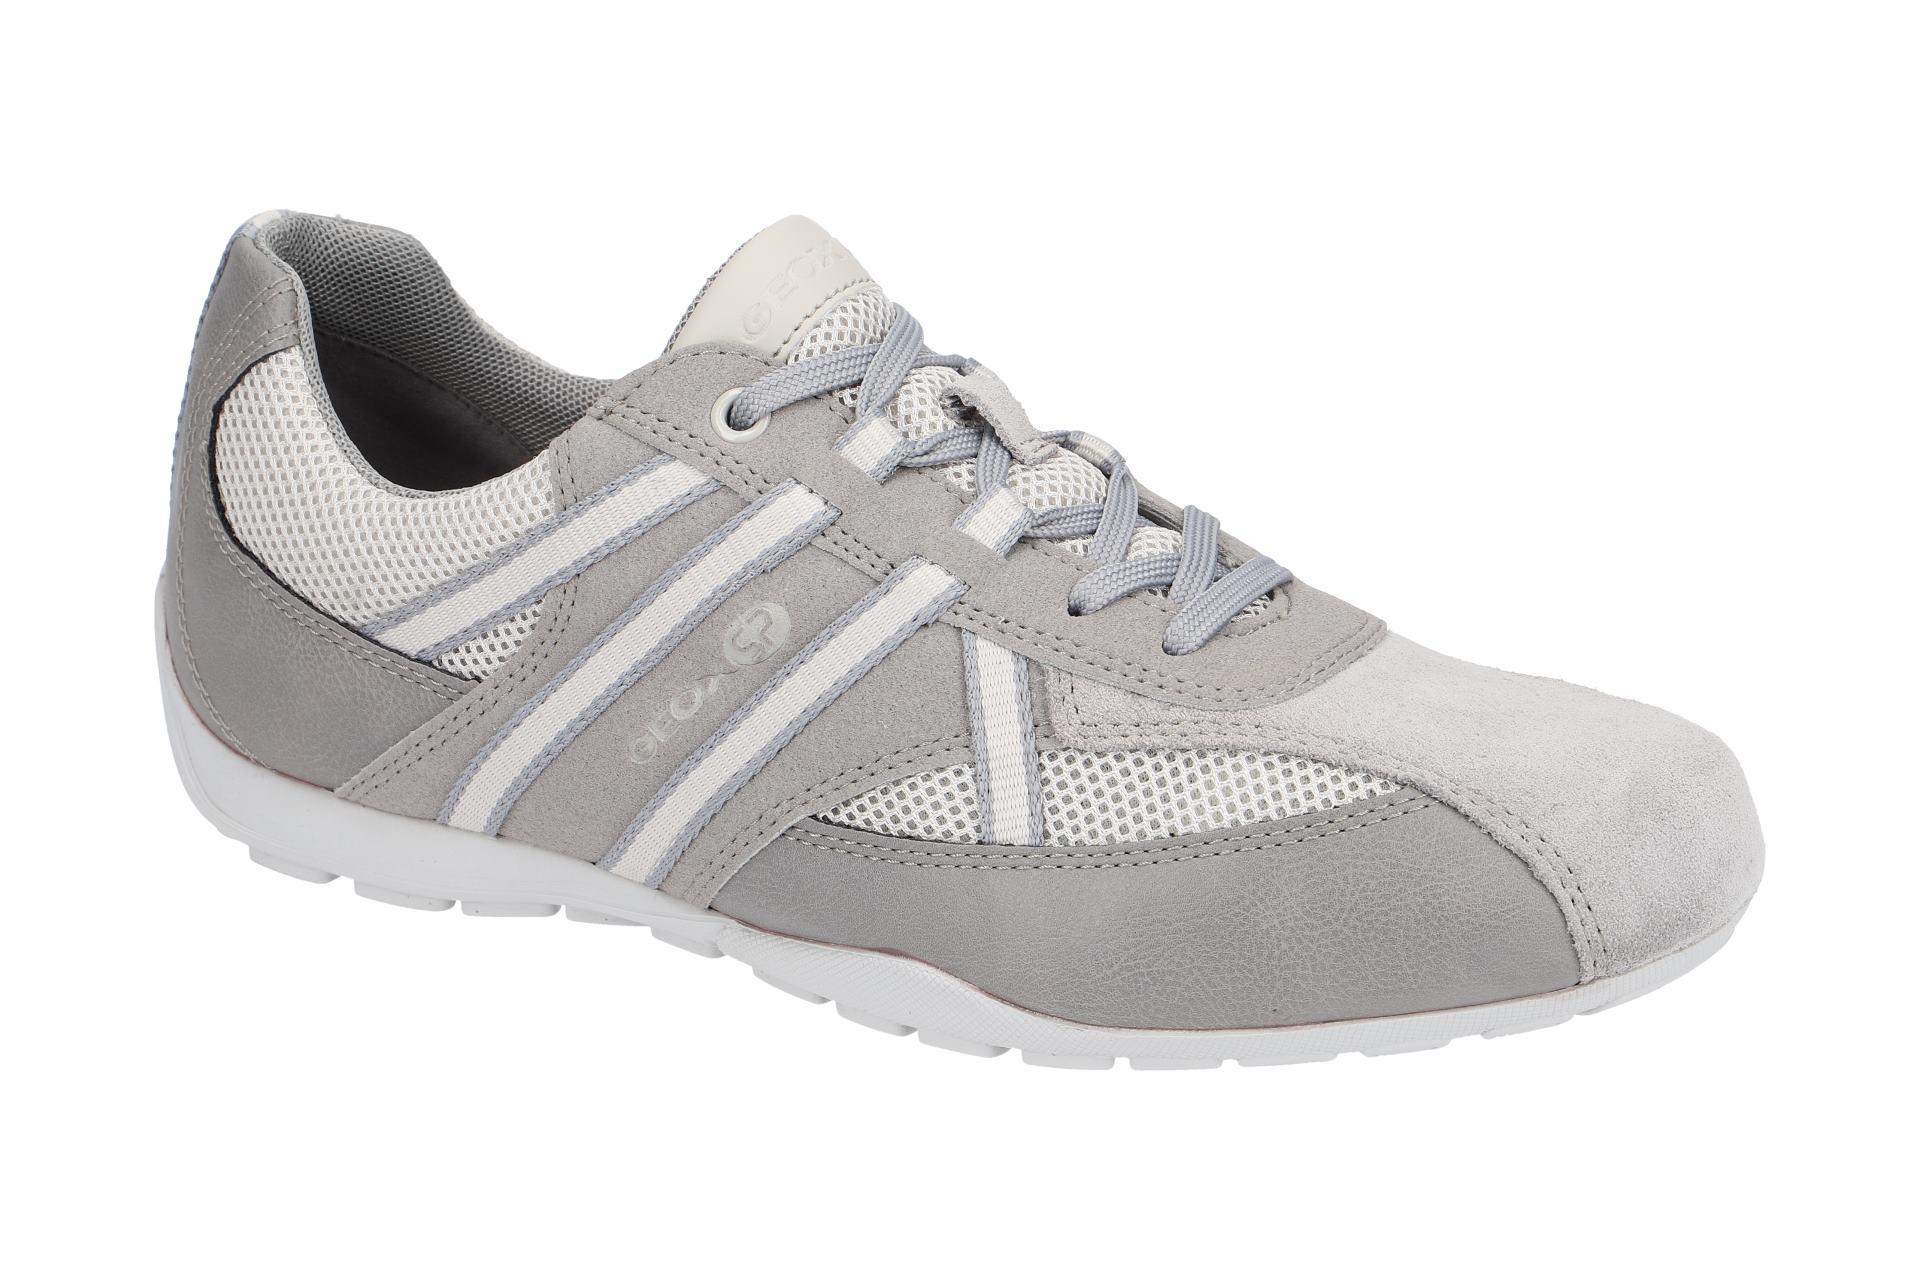 3c55bef6a9454 Geox RaveX Sneaker Schuhe ice grau U923FB - Schuhhaus Strauch Shop